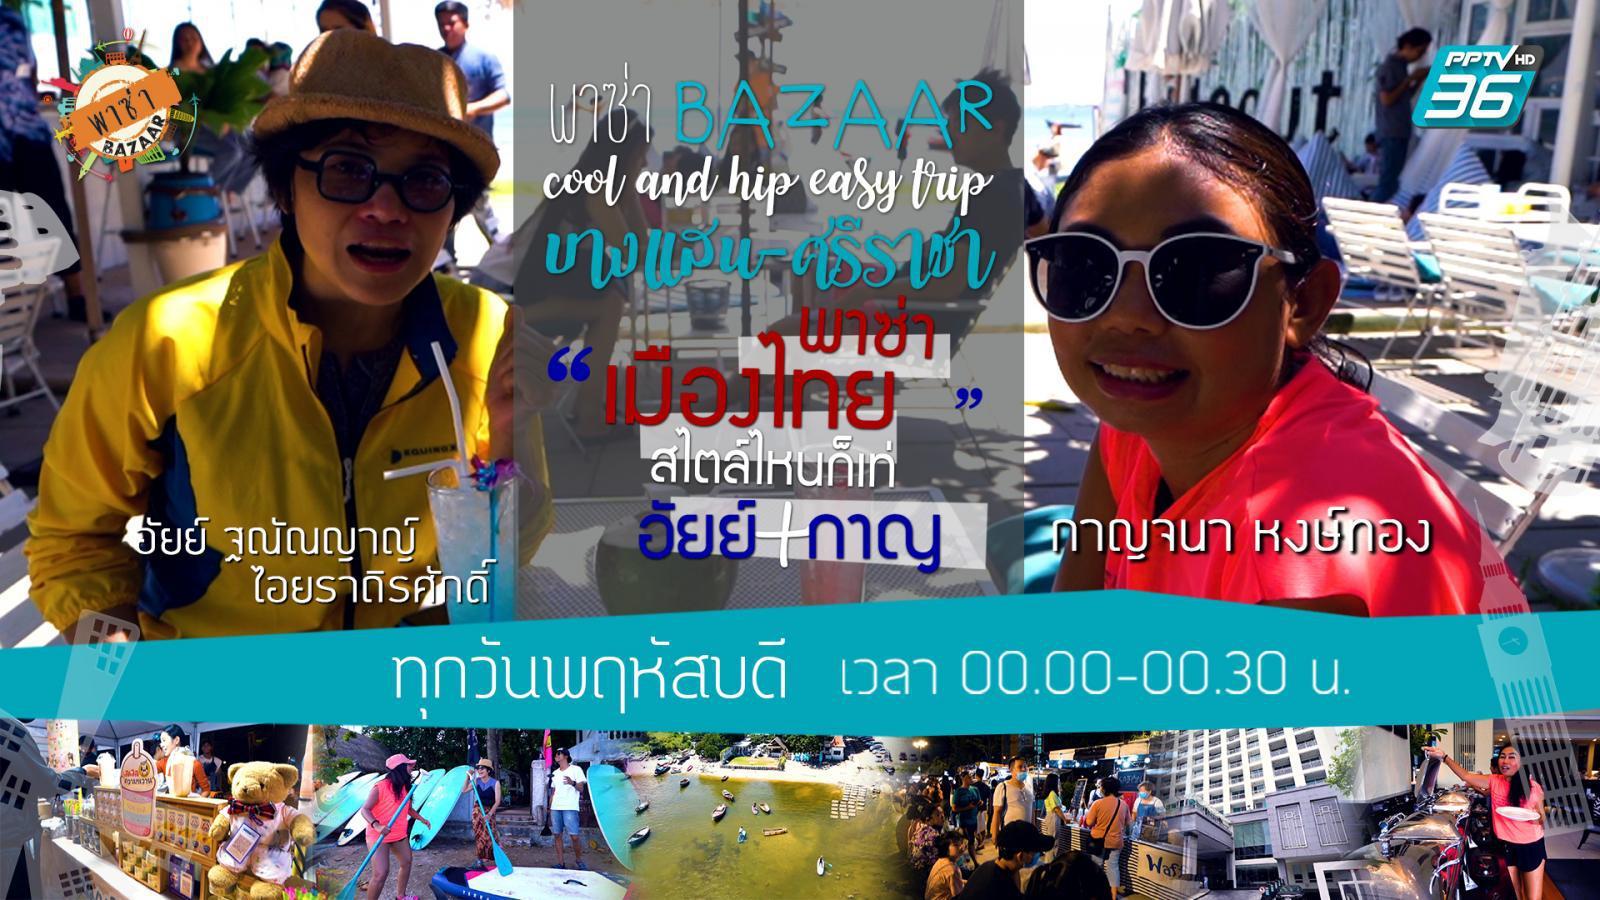 Cool & Hip Easy Trip บางแสน-ศรีราชา